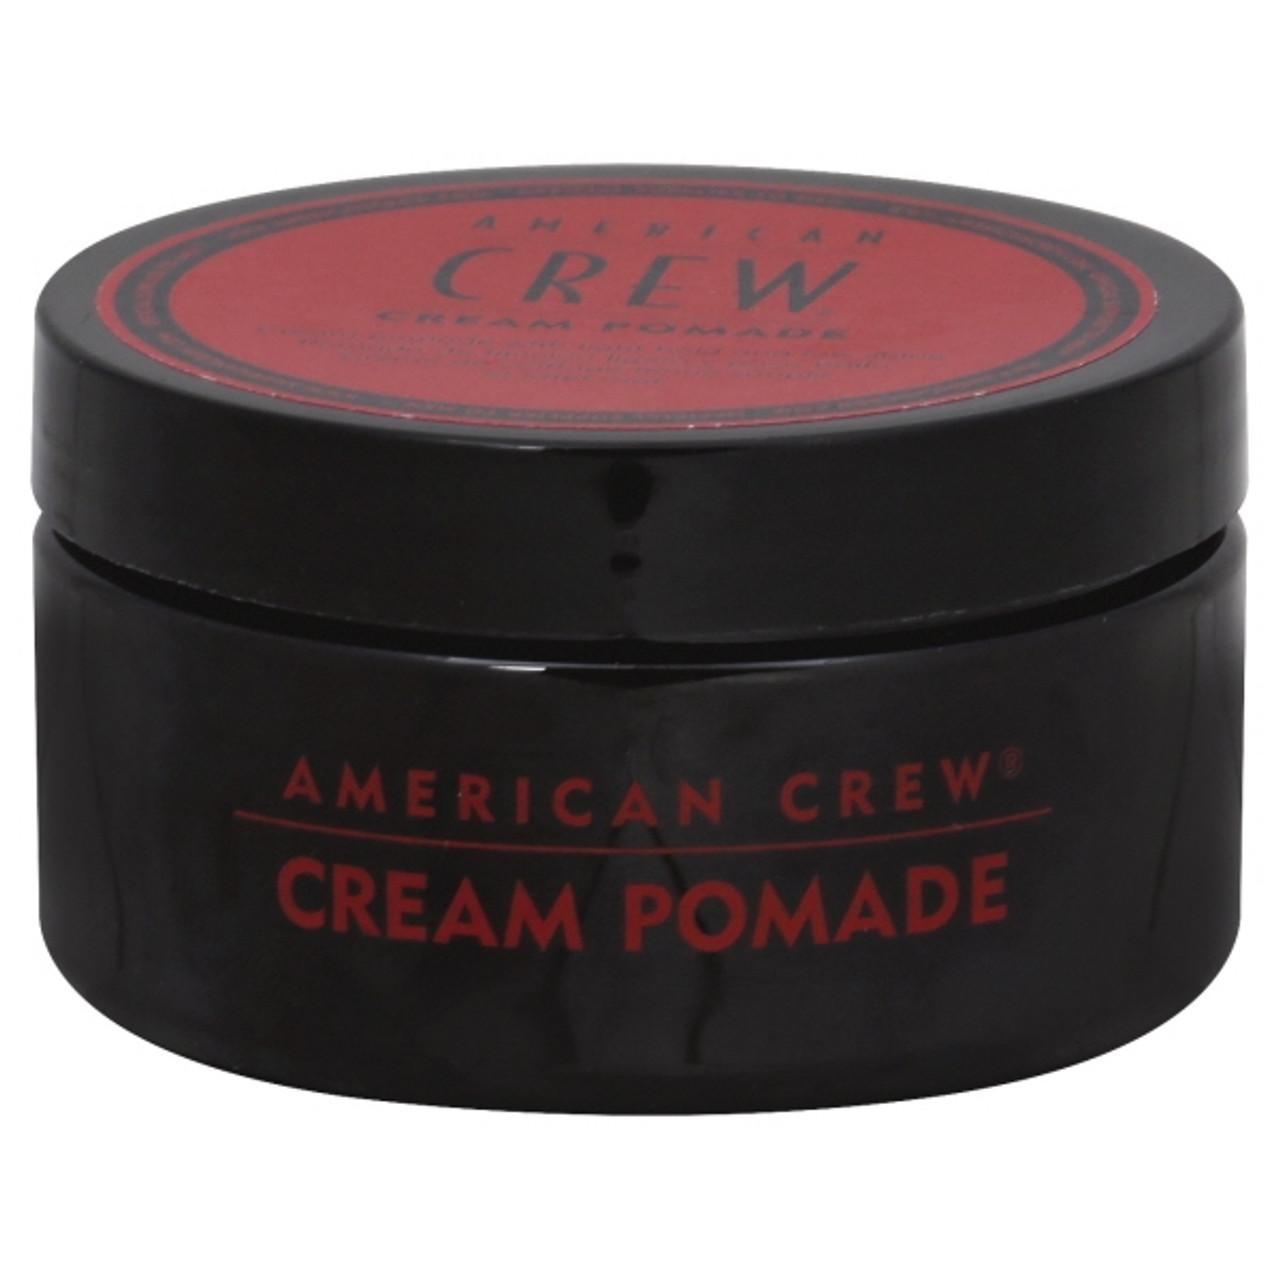 American Crew Cream Pomade 3 Oz